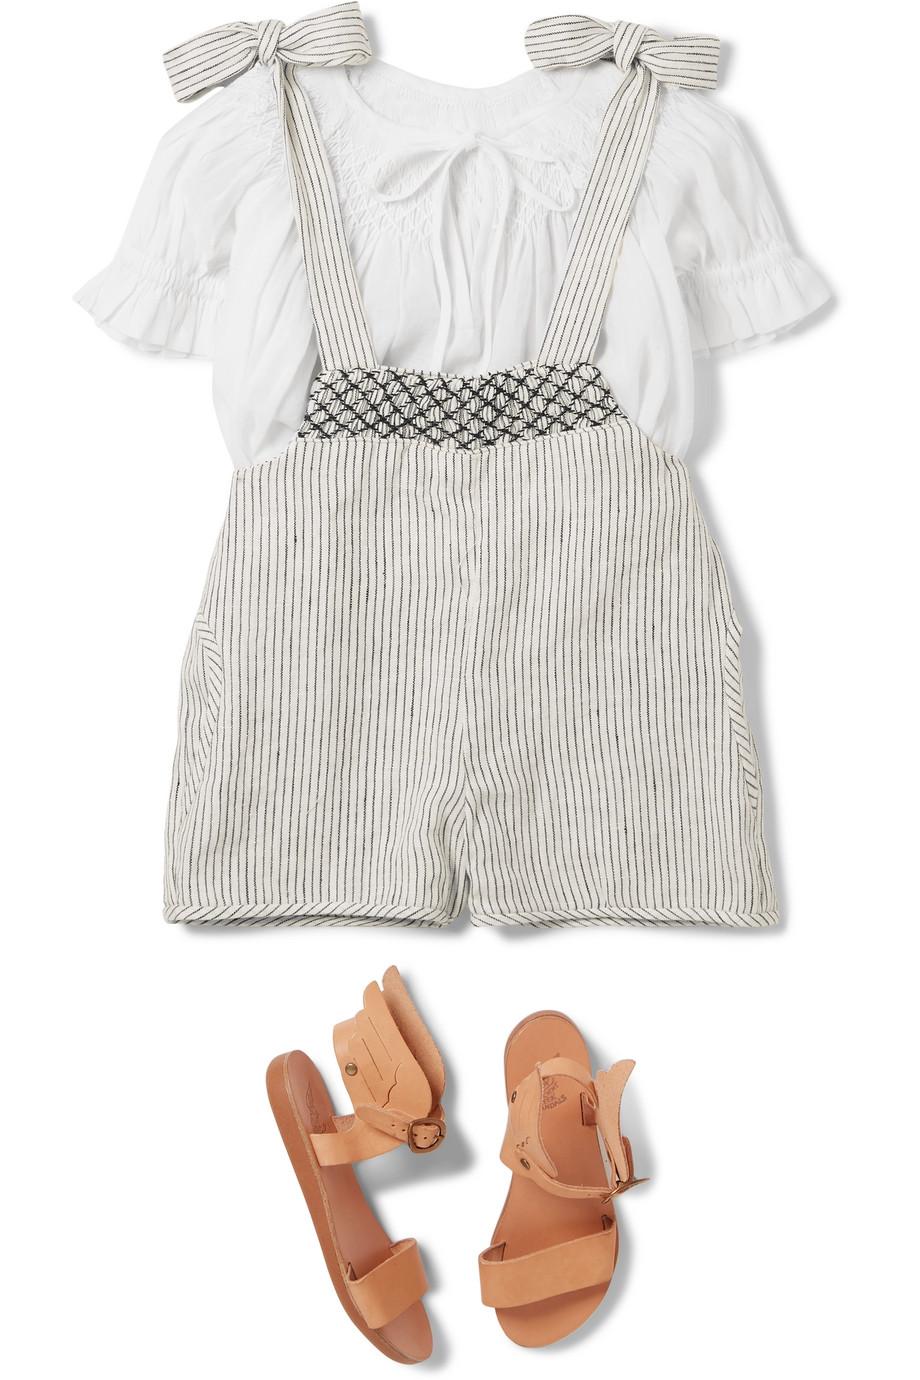 Innika Choo Kids Smocked striped linen dungarees and cotton top set